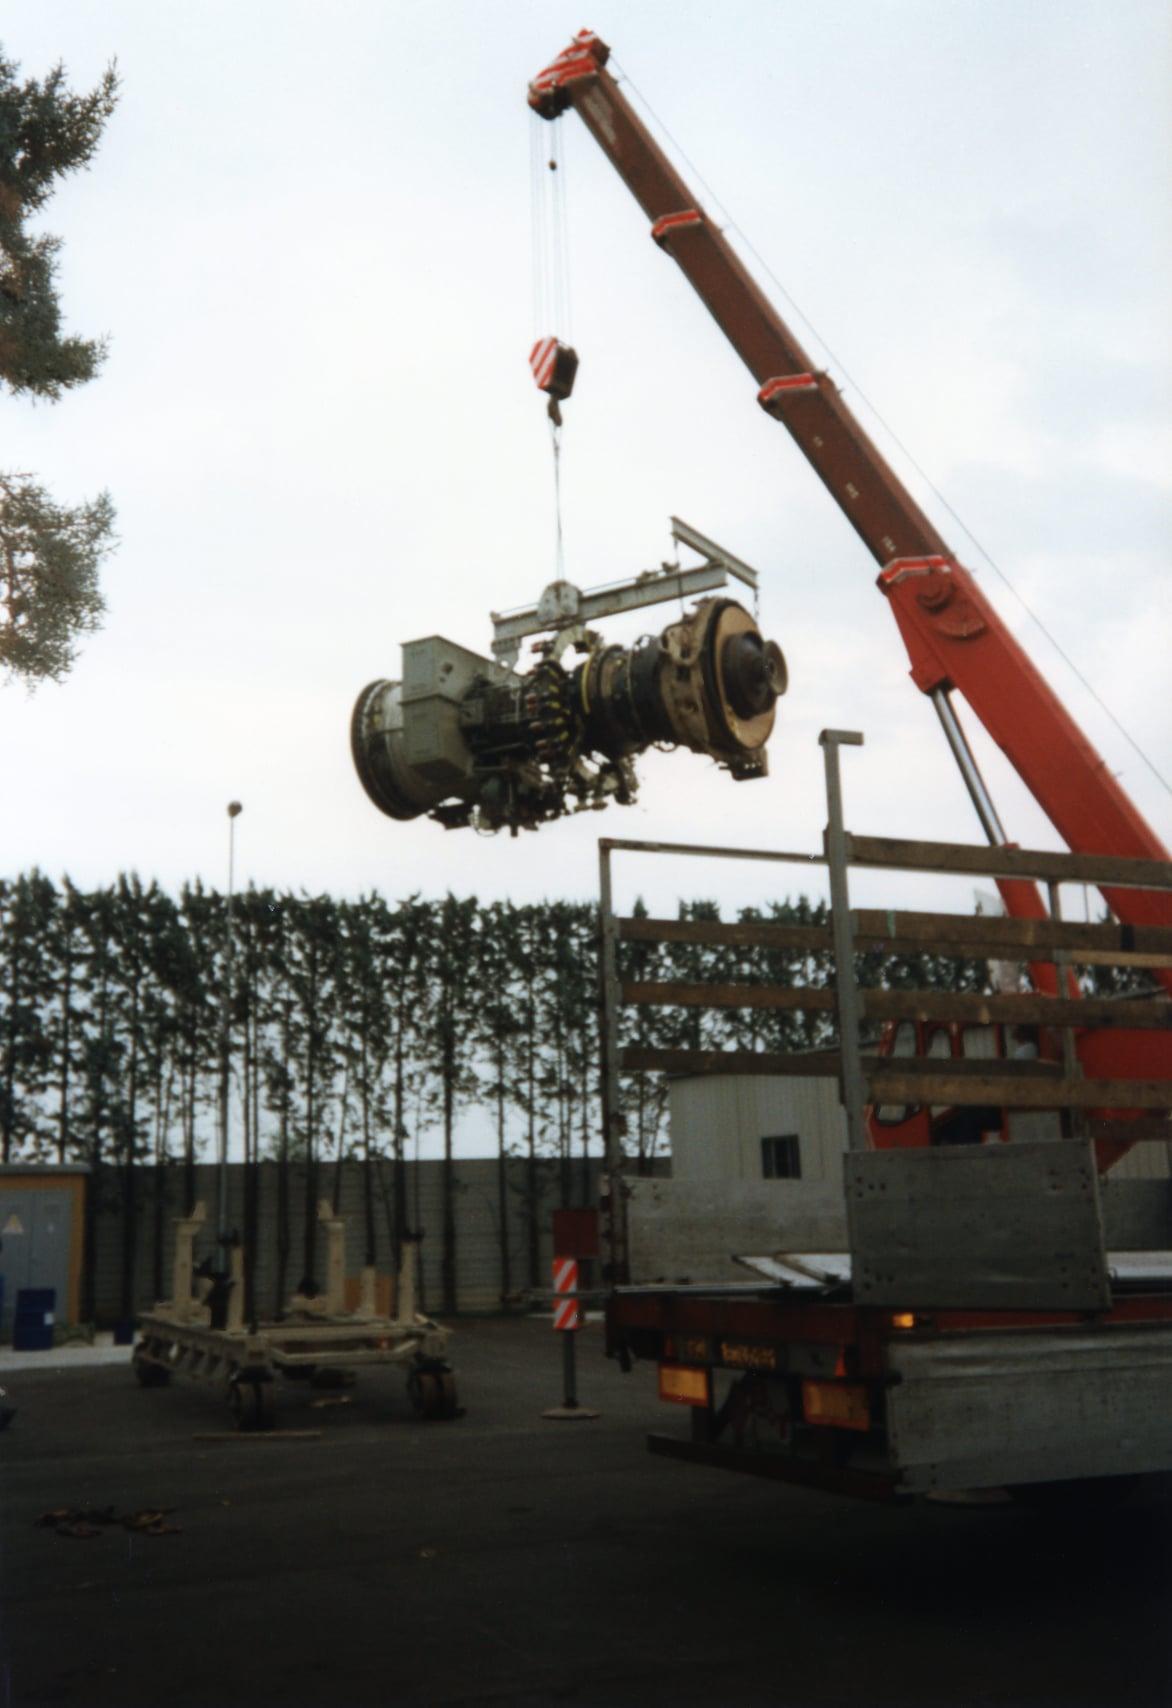 Joop-de-Jong-Vliegtuigmotor-laden-Fa-Sontel-Porcari-19-6-1997-17-ton-van-8-tot-17-uur-(4)